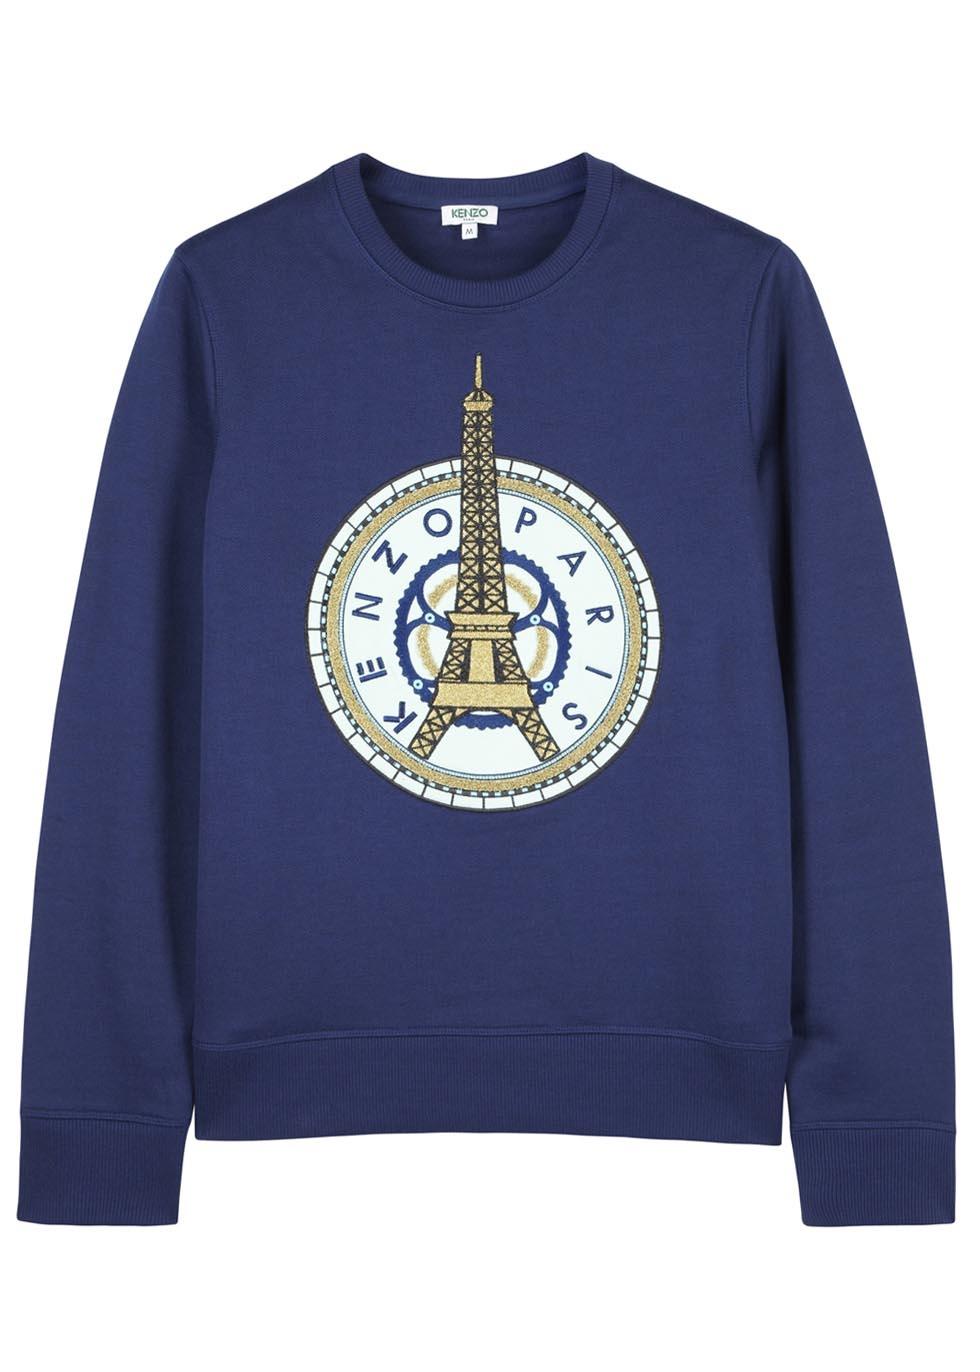 0e3dc9ac KENZO Navy Eiffel Tower Cotton Blend Sweatshirt in Blue for Men - Lyst